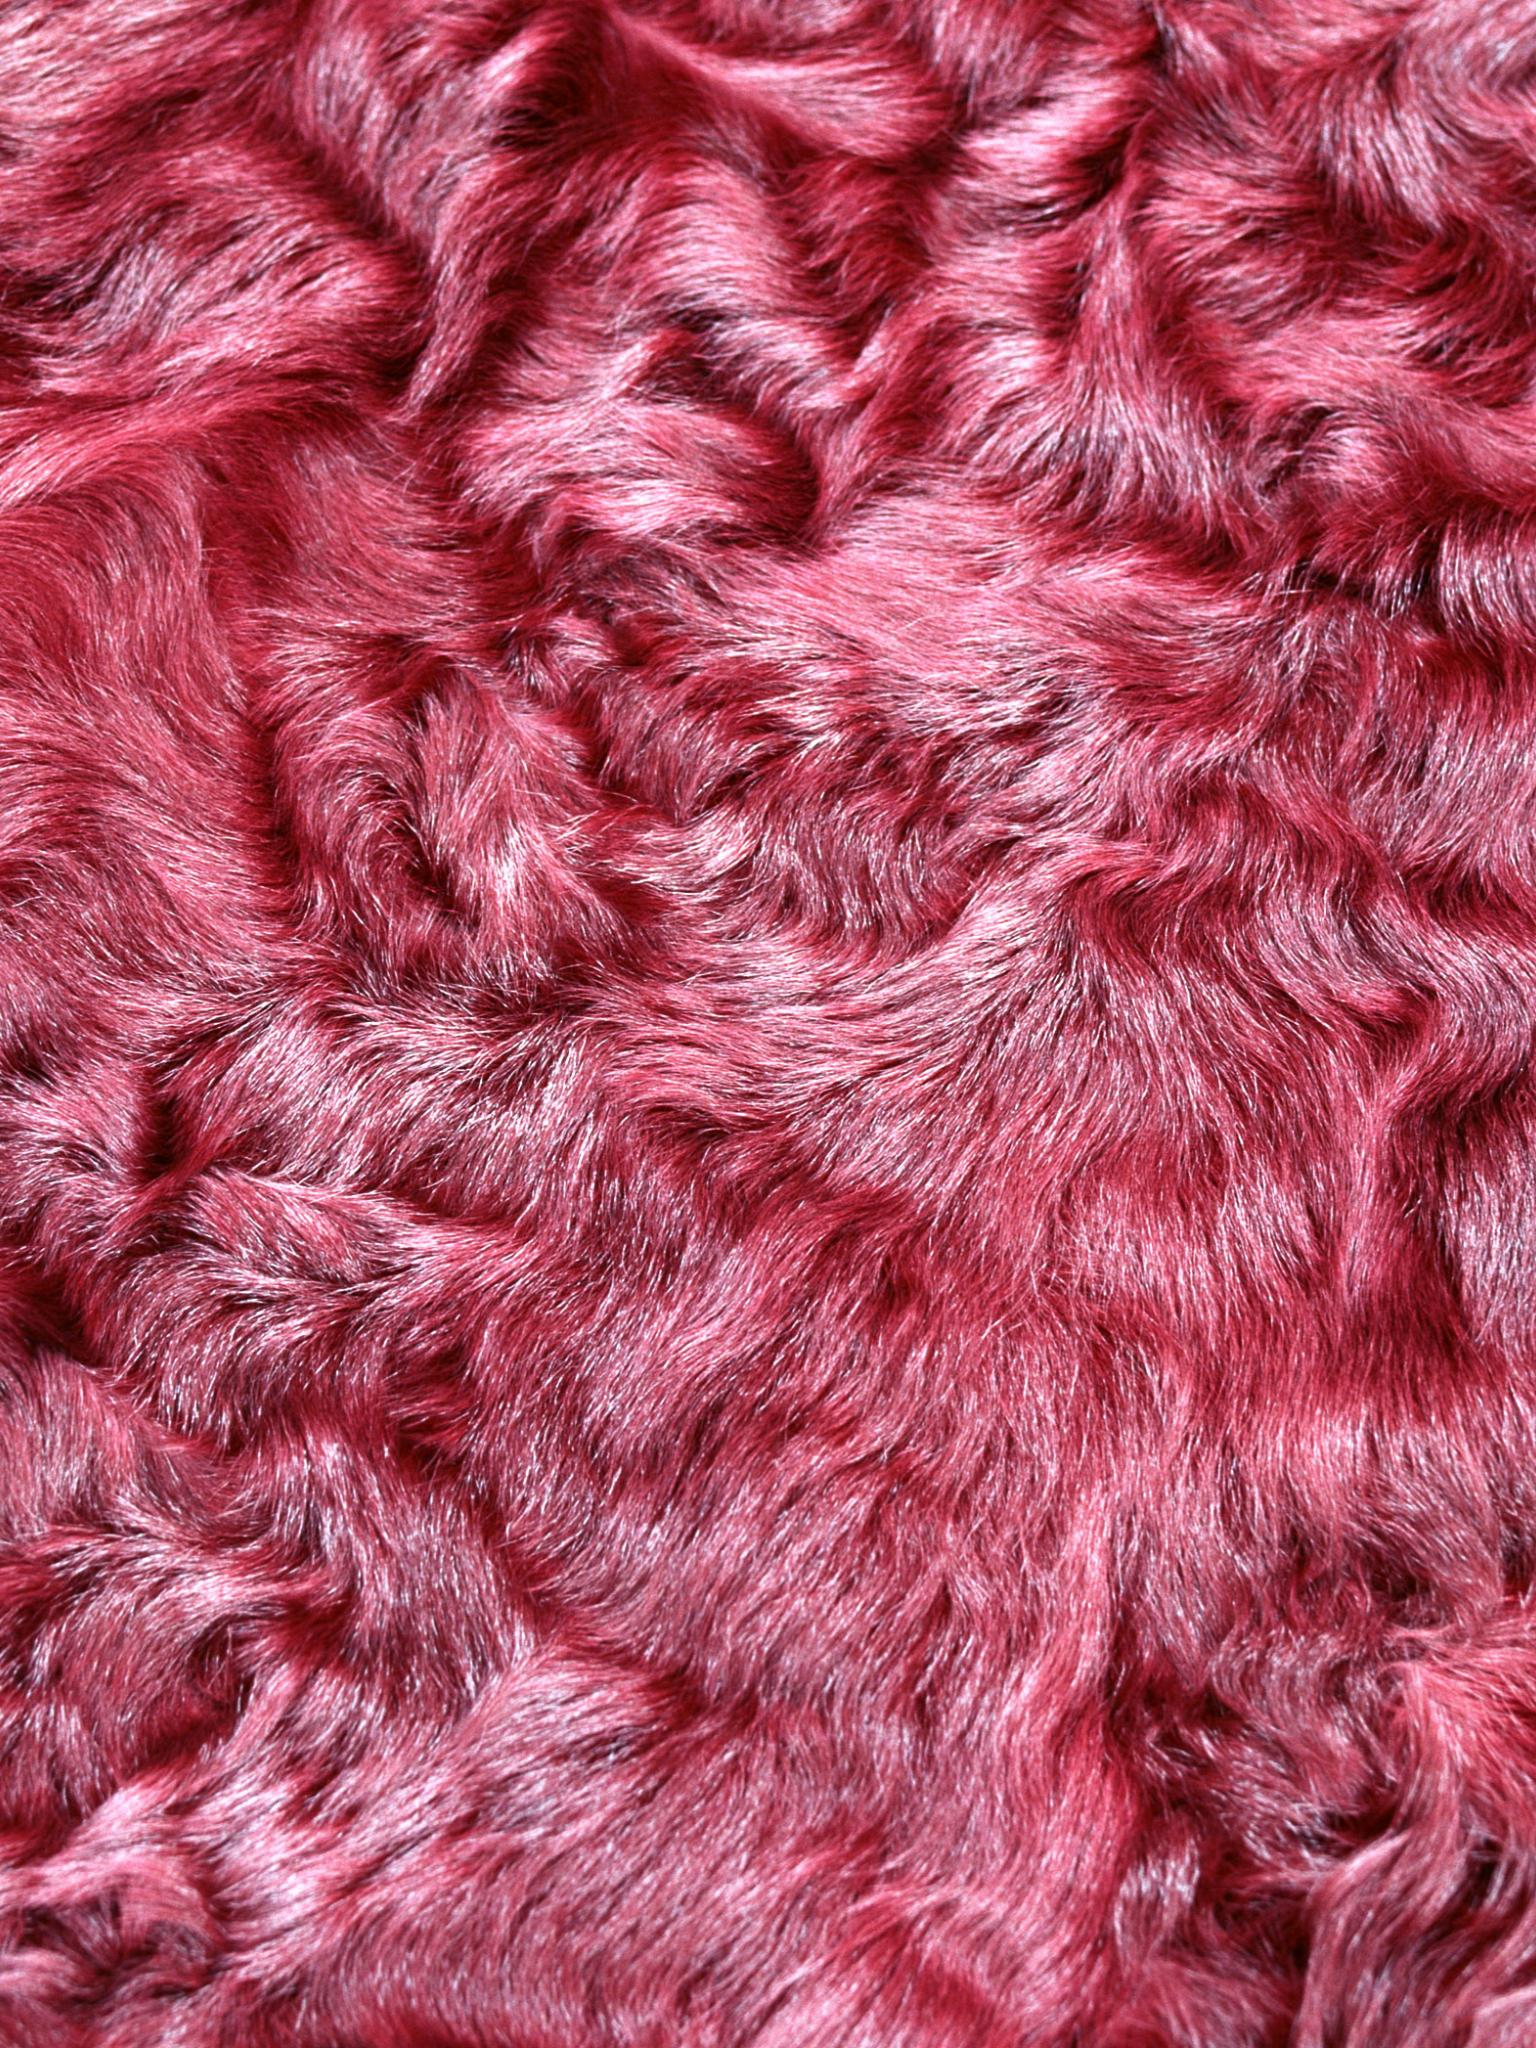 Free Download Download Texture Pink Fur Texture Background Image